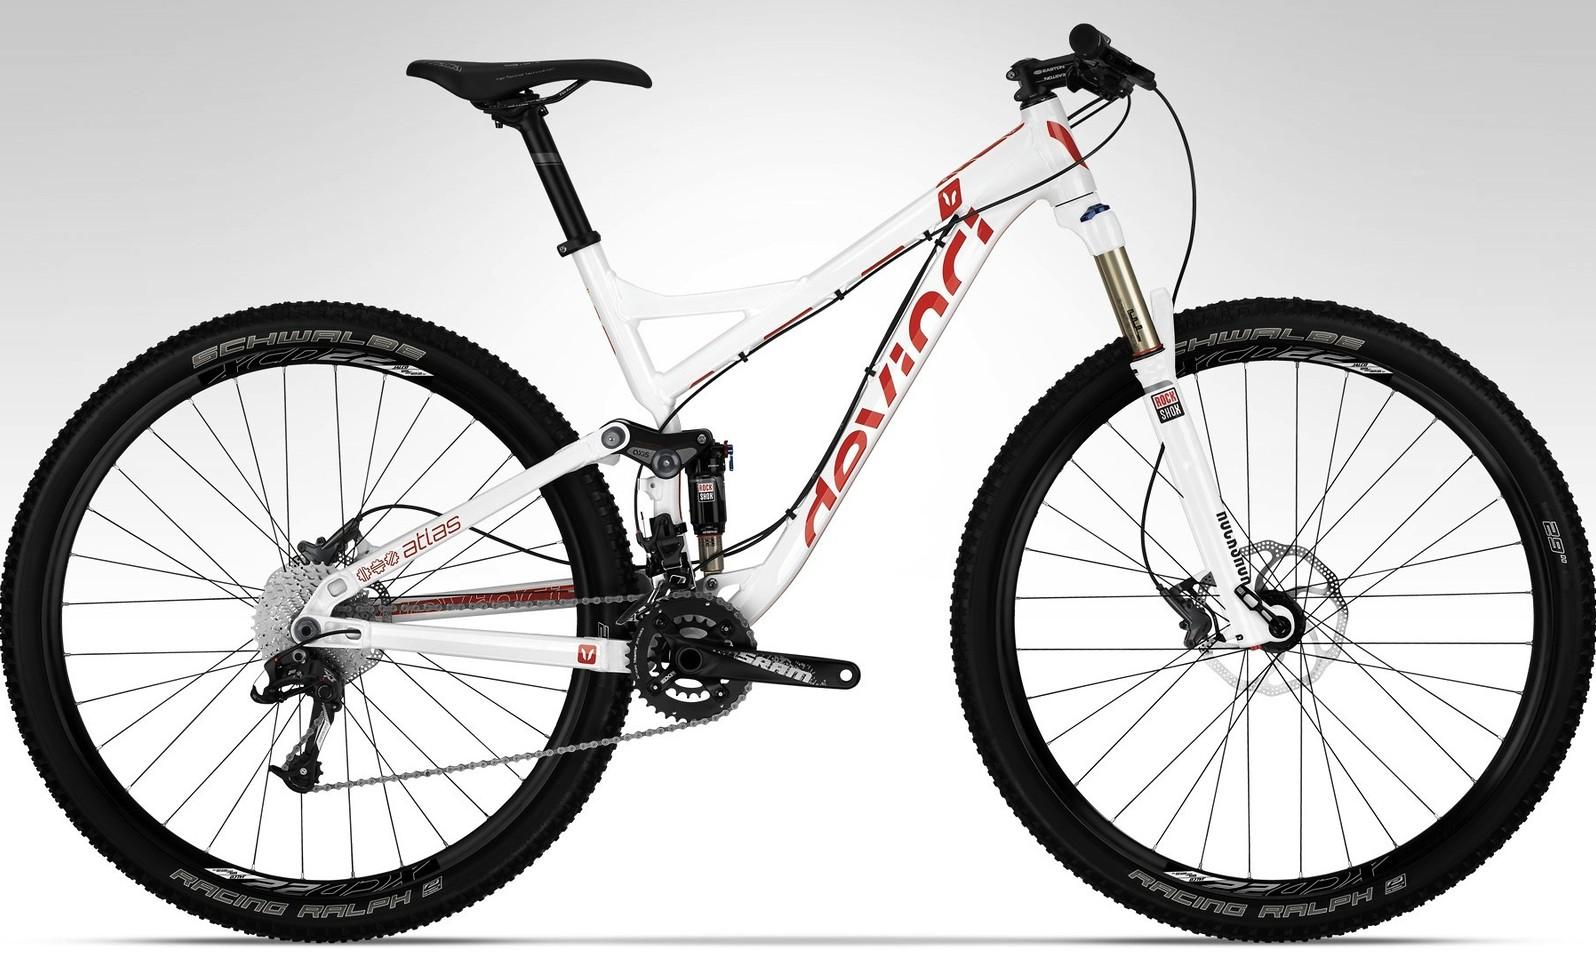 Devinci ATLAS XP bike